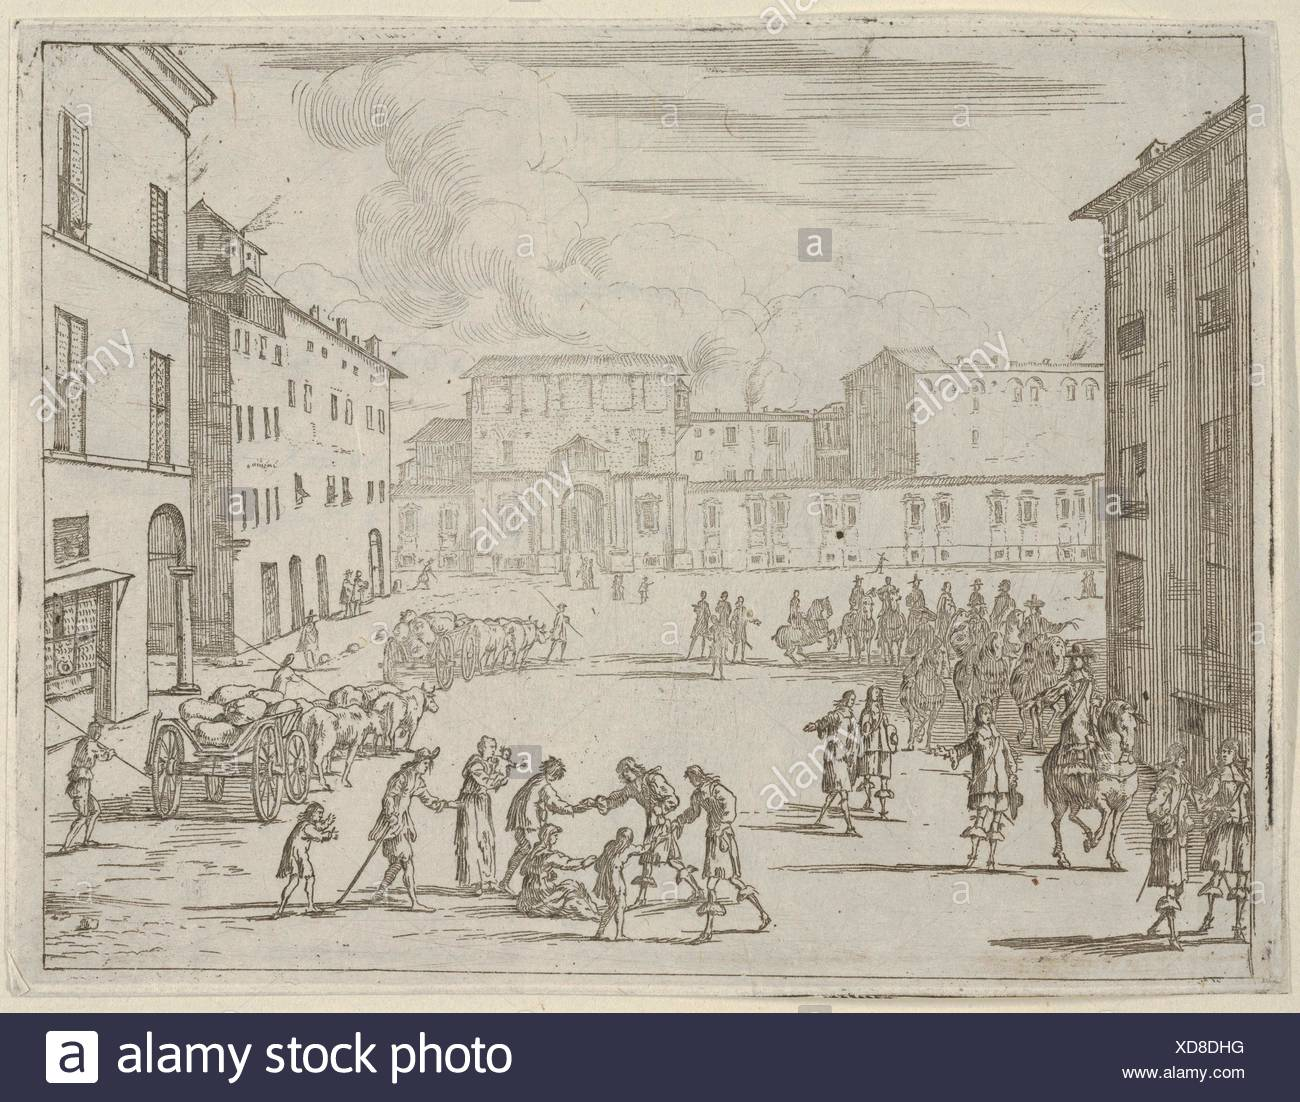 Francesco I d'Este aide ses sujets avec une grande générosité lors de la Grande Famine de 1648 et 1649, de l'idea di un principe ed Eroe Cristiano Photo Stock